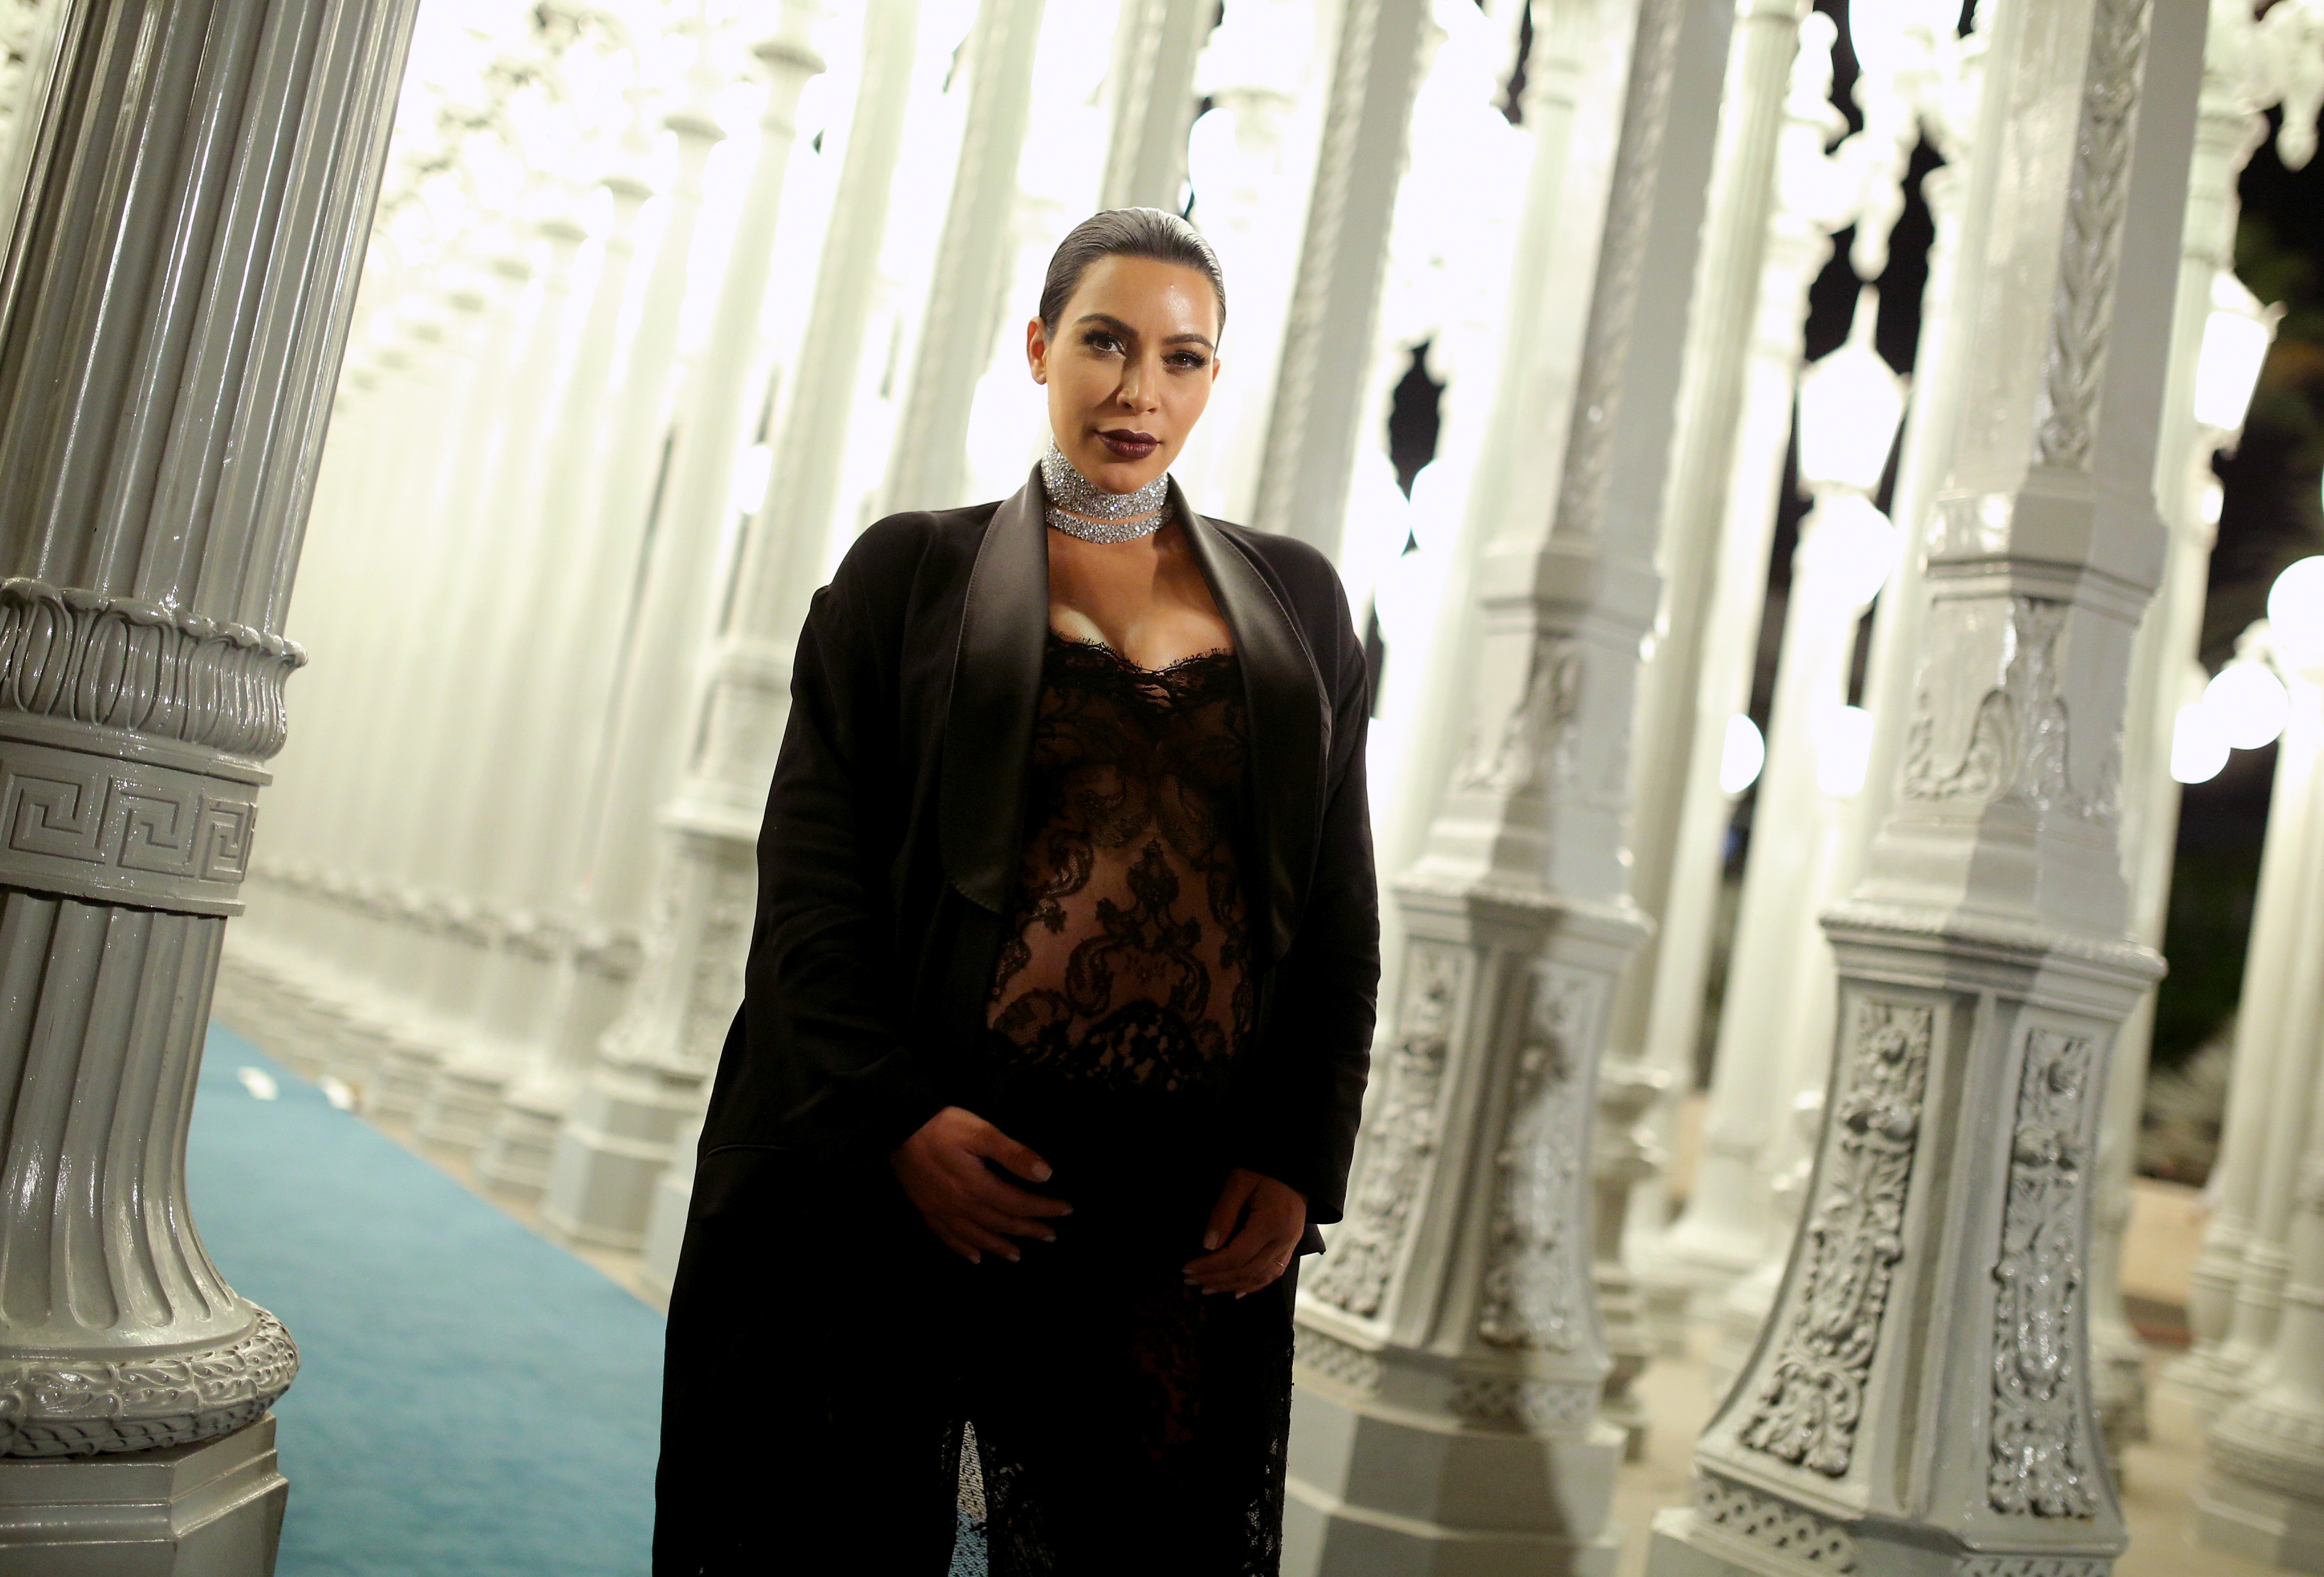 Kim Kardashian West attends LACMA 2015 Art+Film Gala  at LACMA on November 7, 2015 in Los Angeles, California.